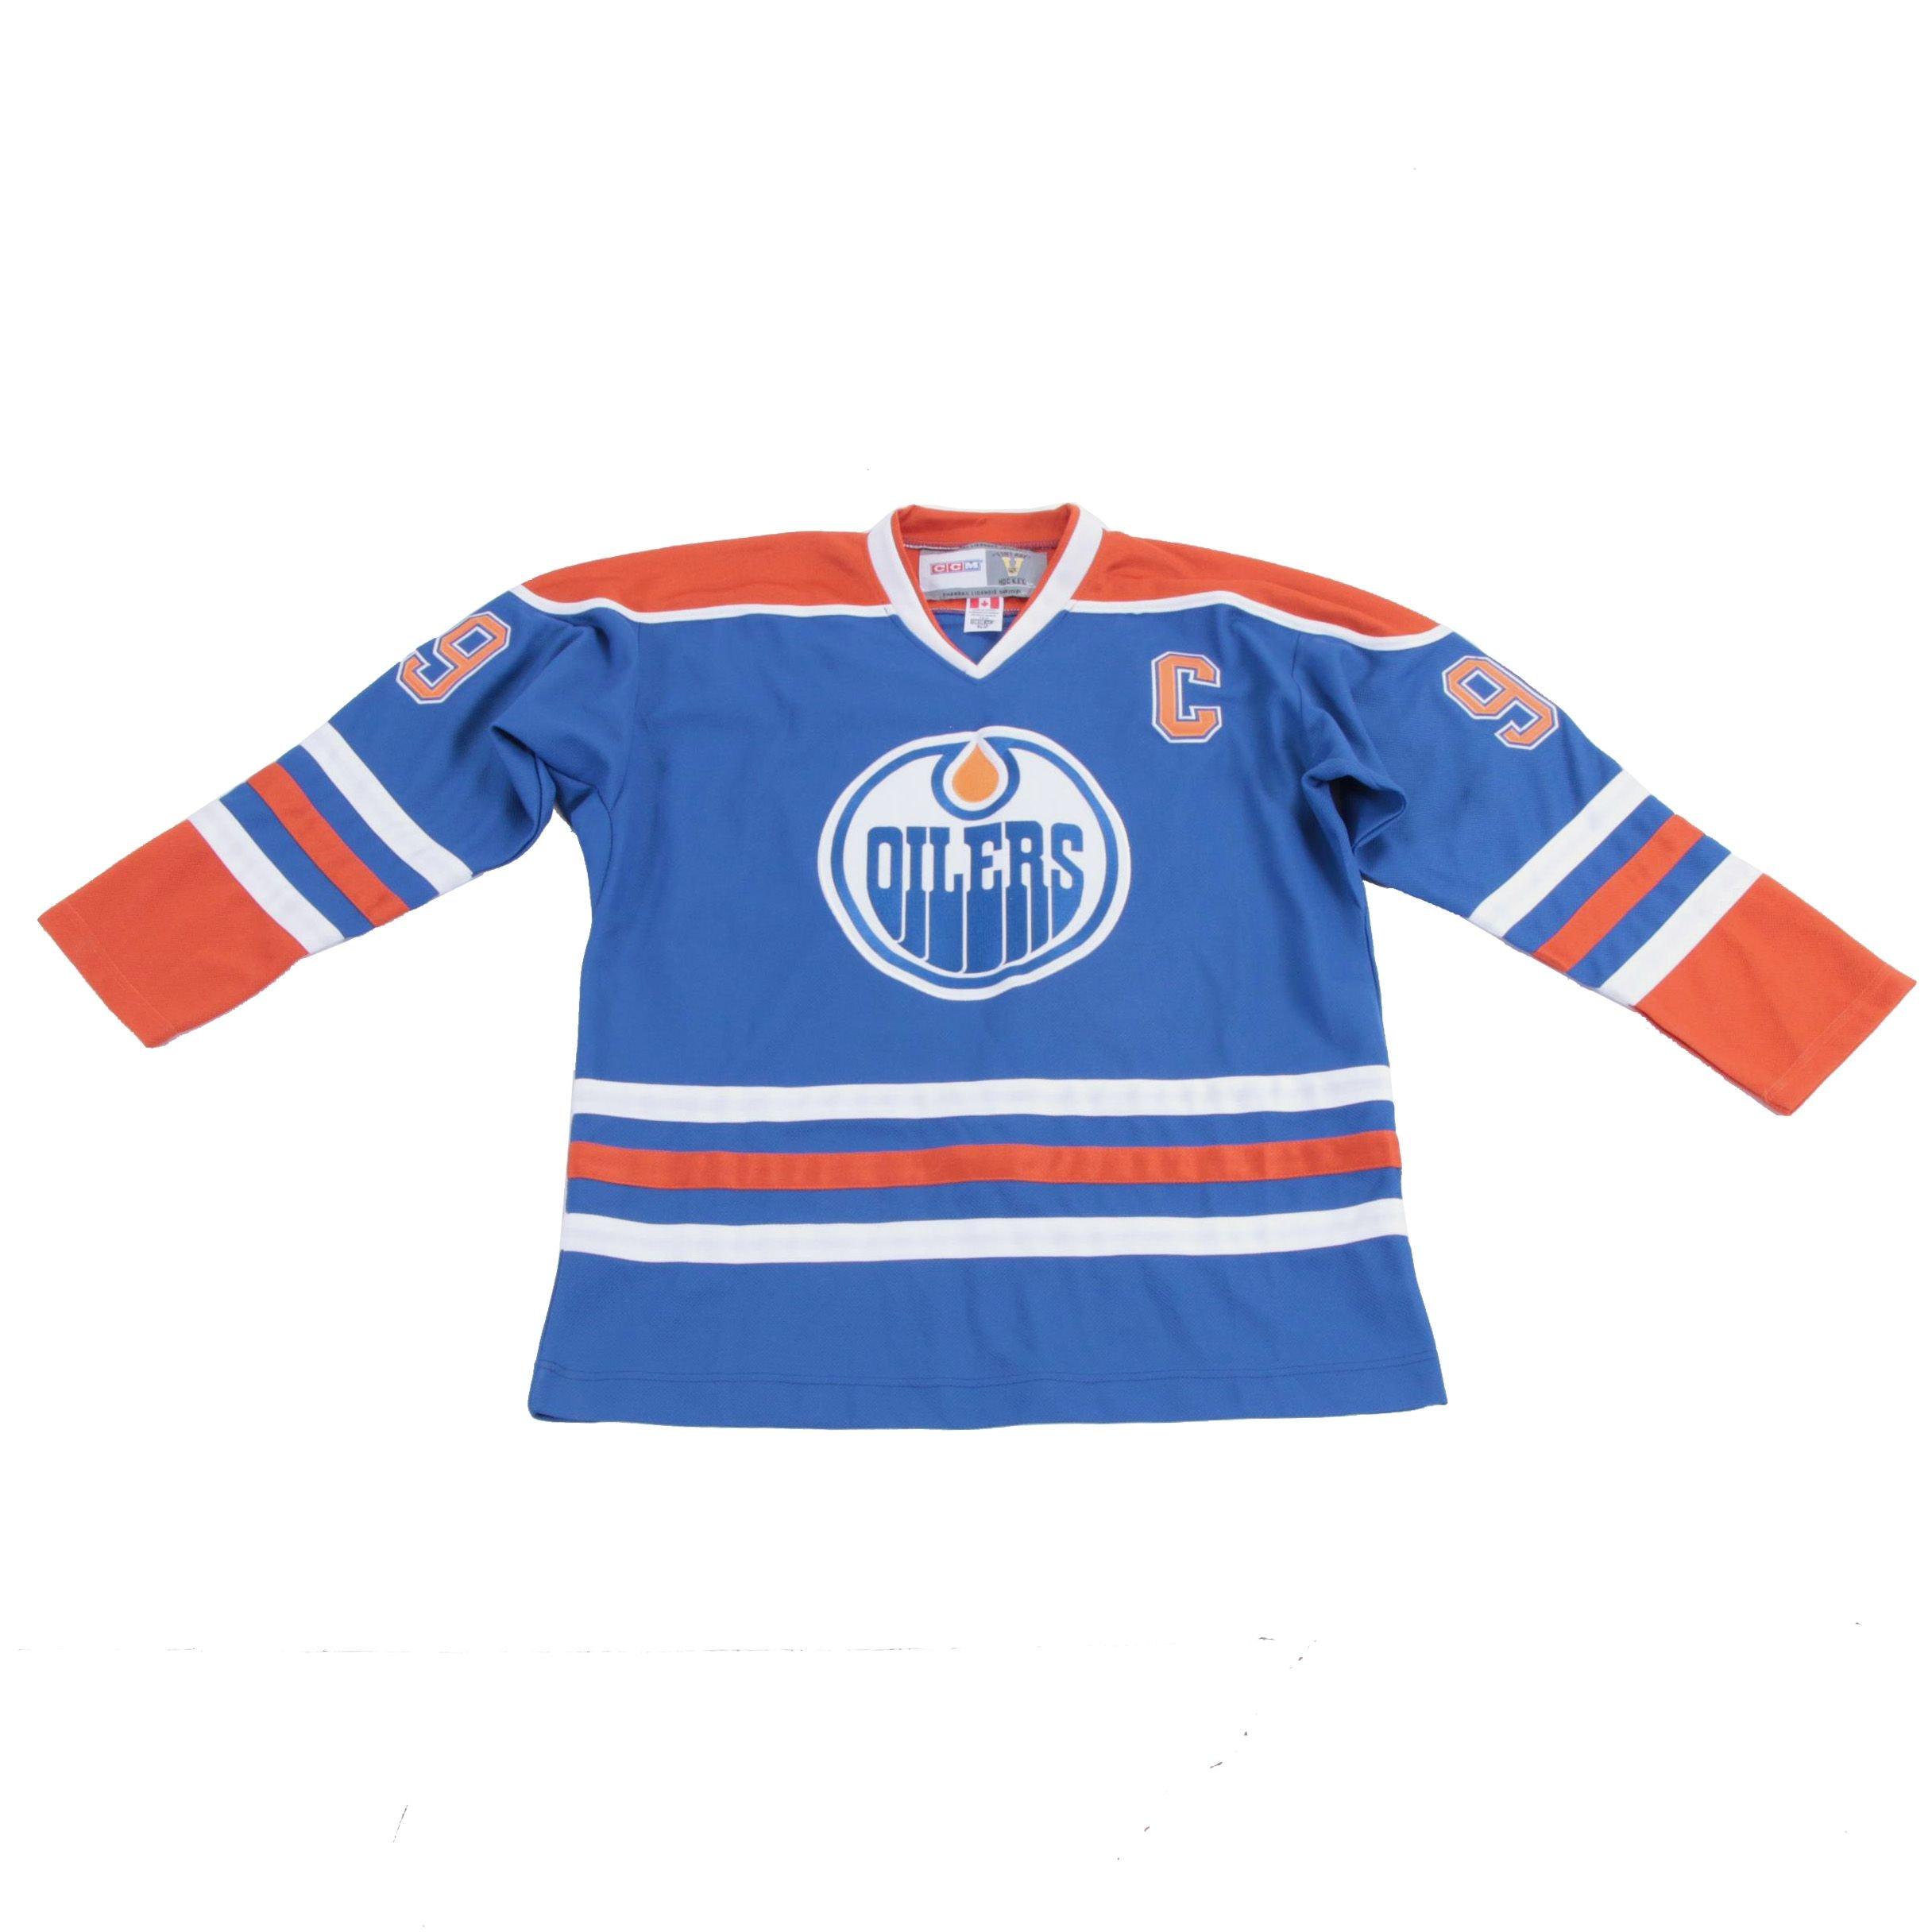 Wayne Gretzky Signed Oilers Jersey  COA